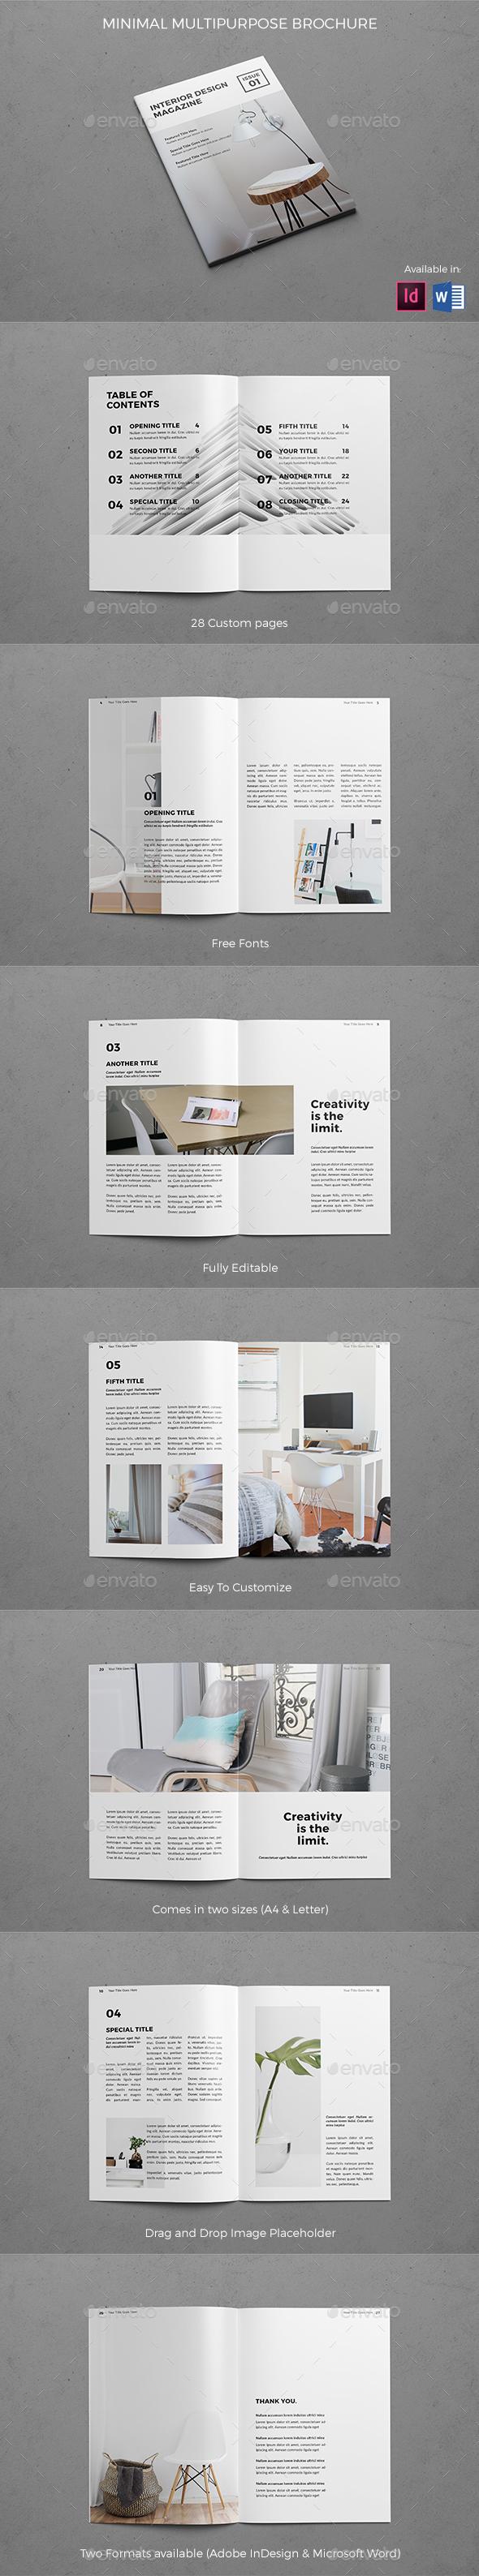 Modern Architecture Brochure - Brochures Print Templates